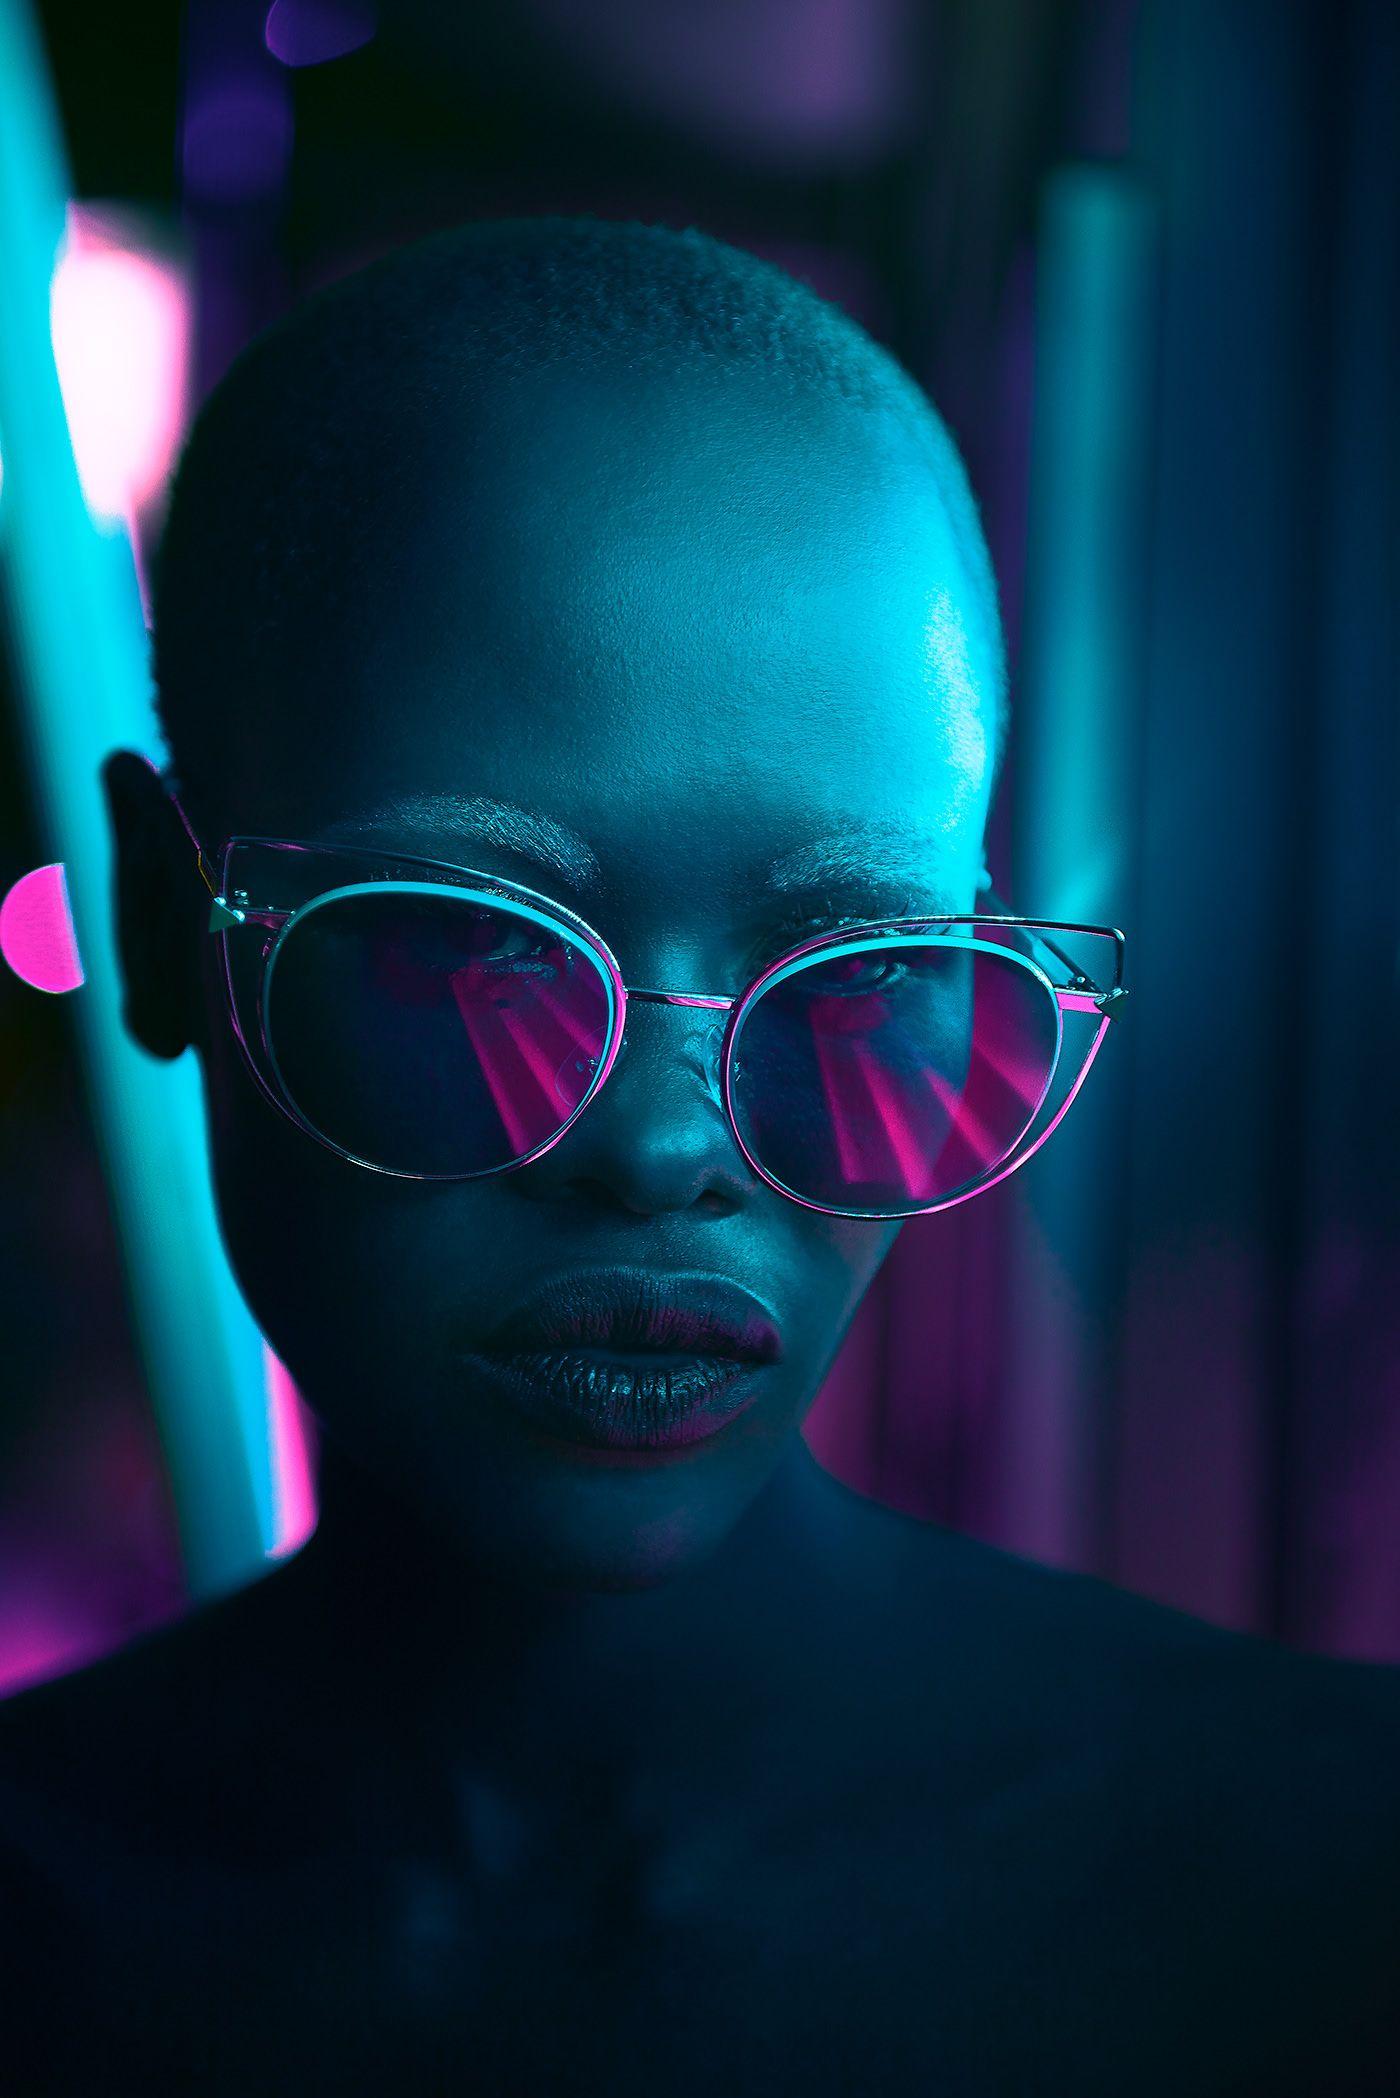 Behance Best of Behance Neon photography, Beauty